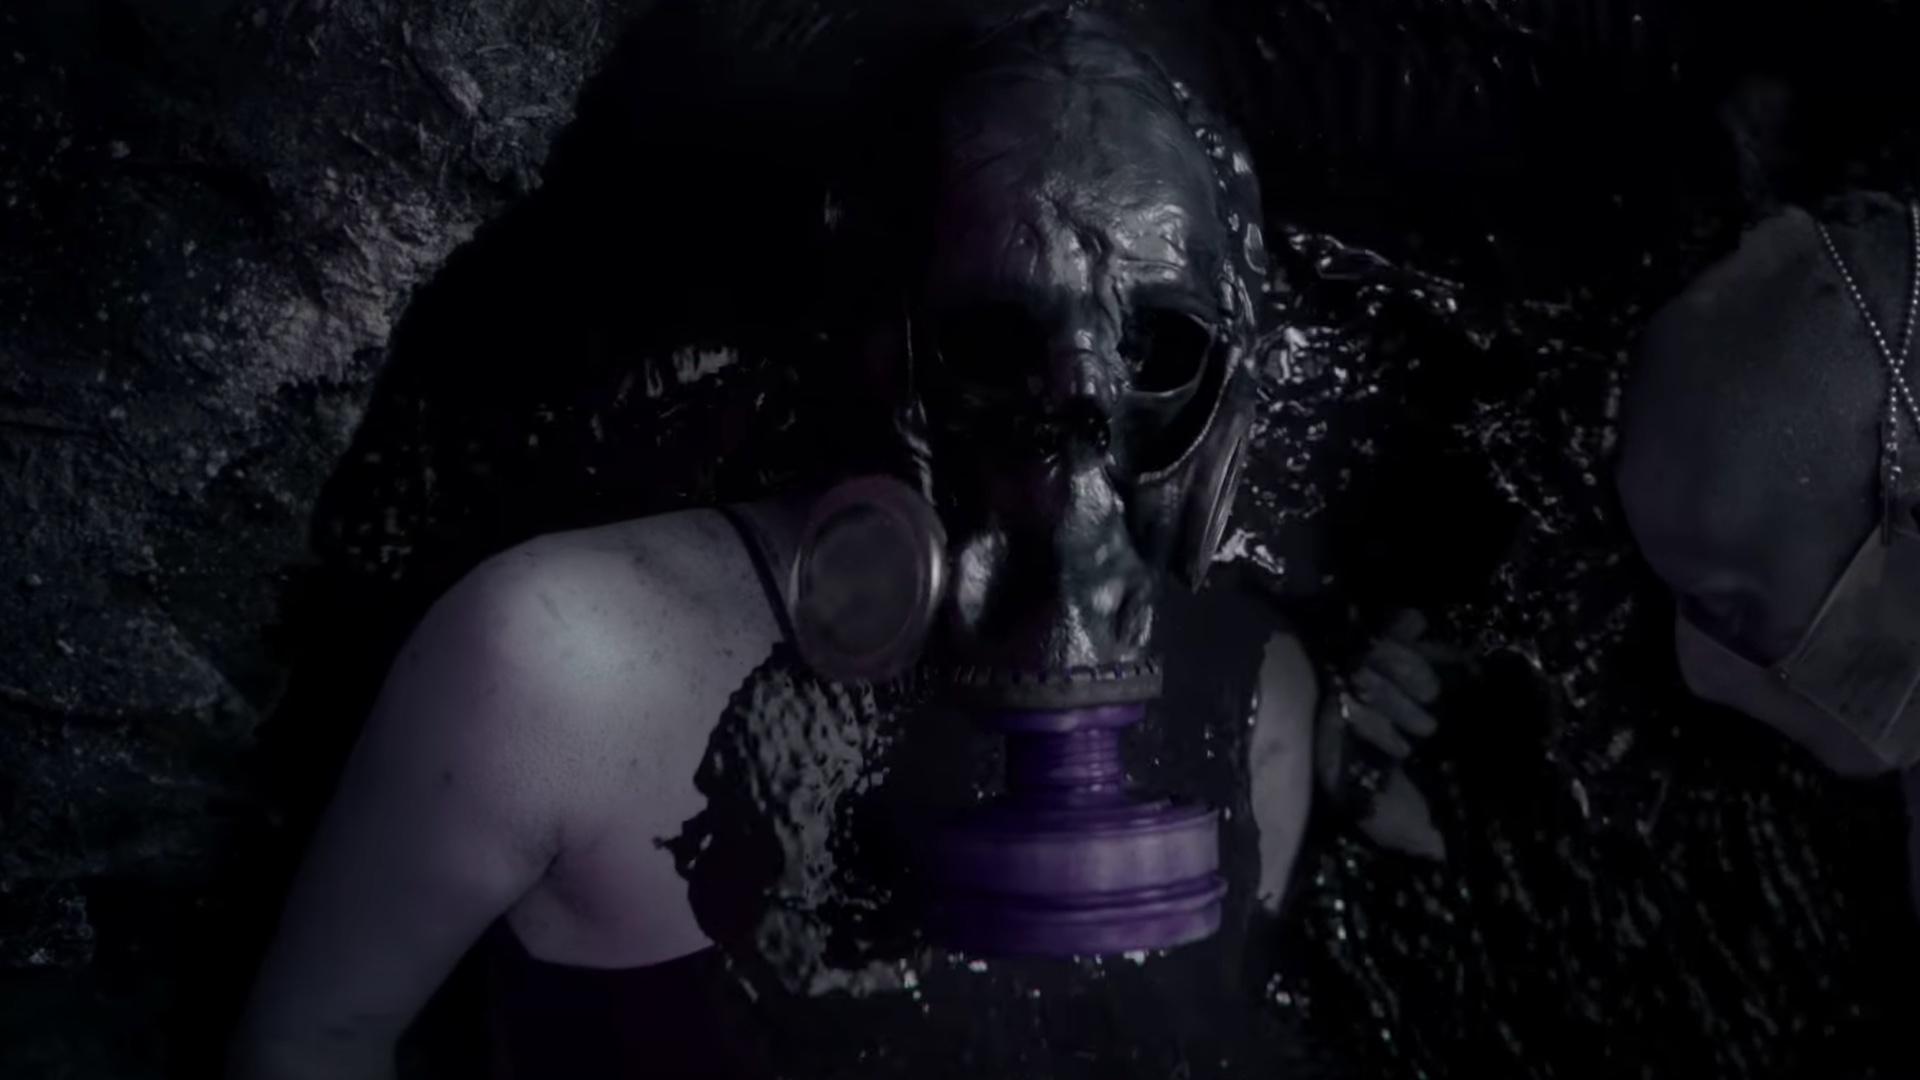 first-disturbing-promo-spot-for-american-horror-story-apocalypse-social.jpg